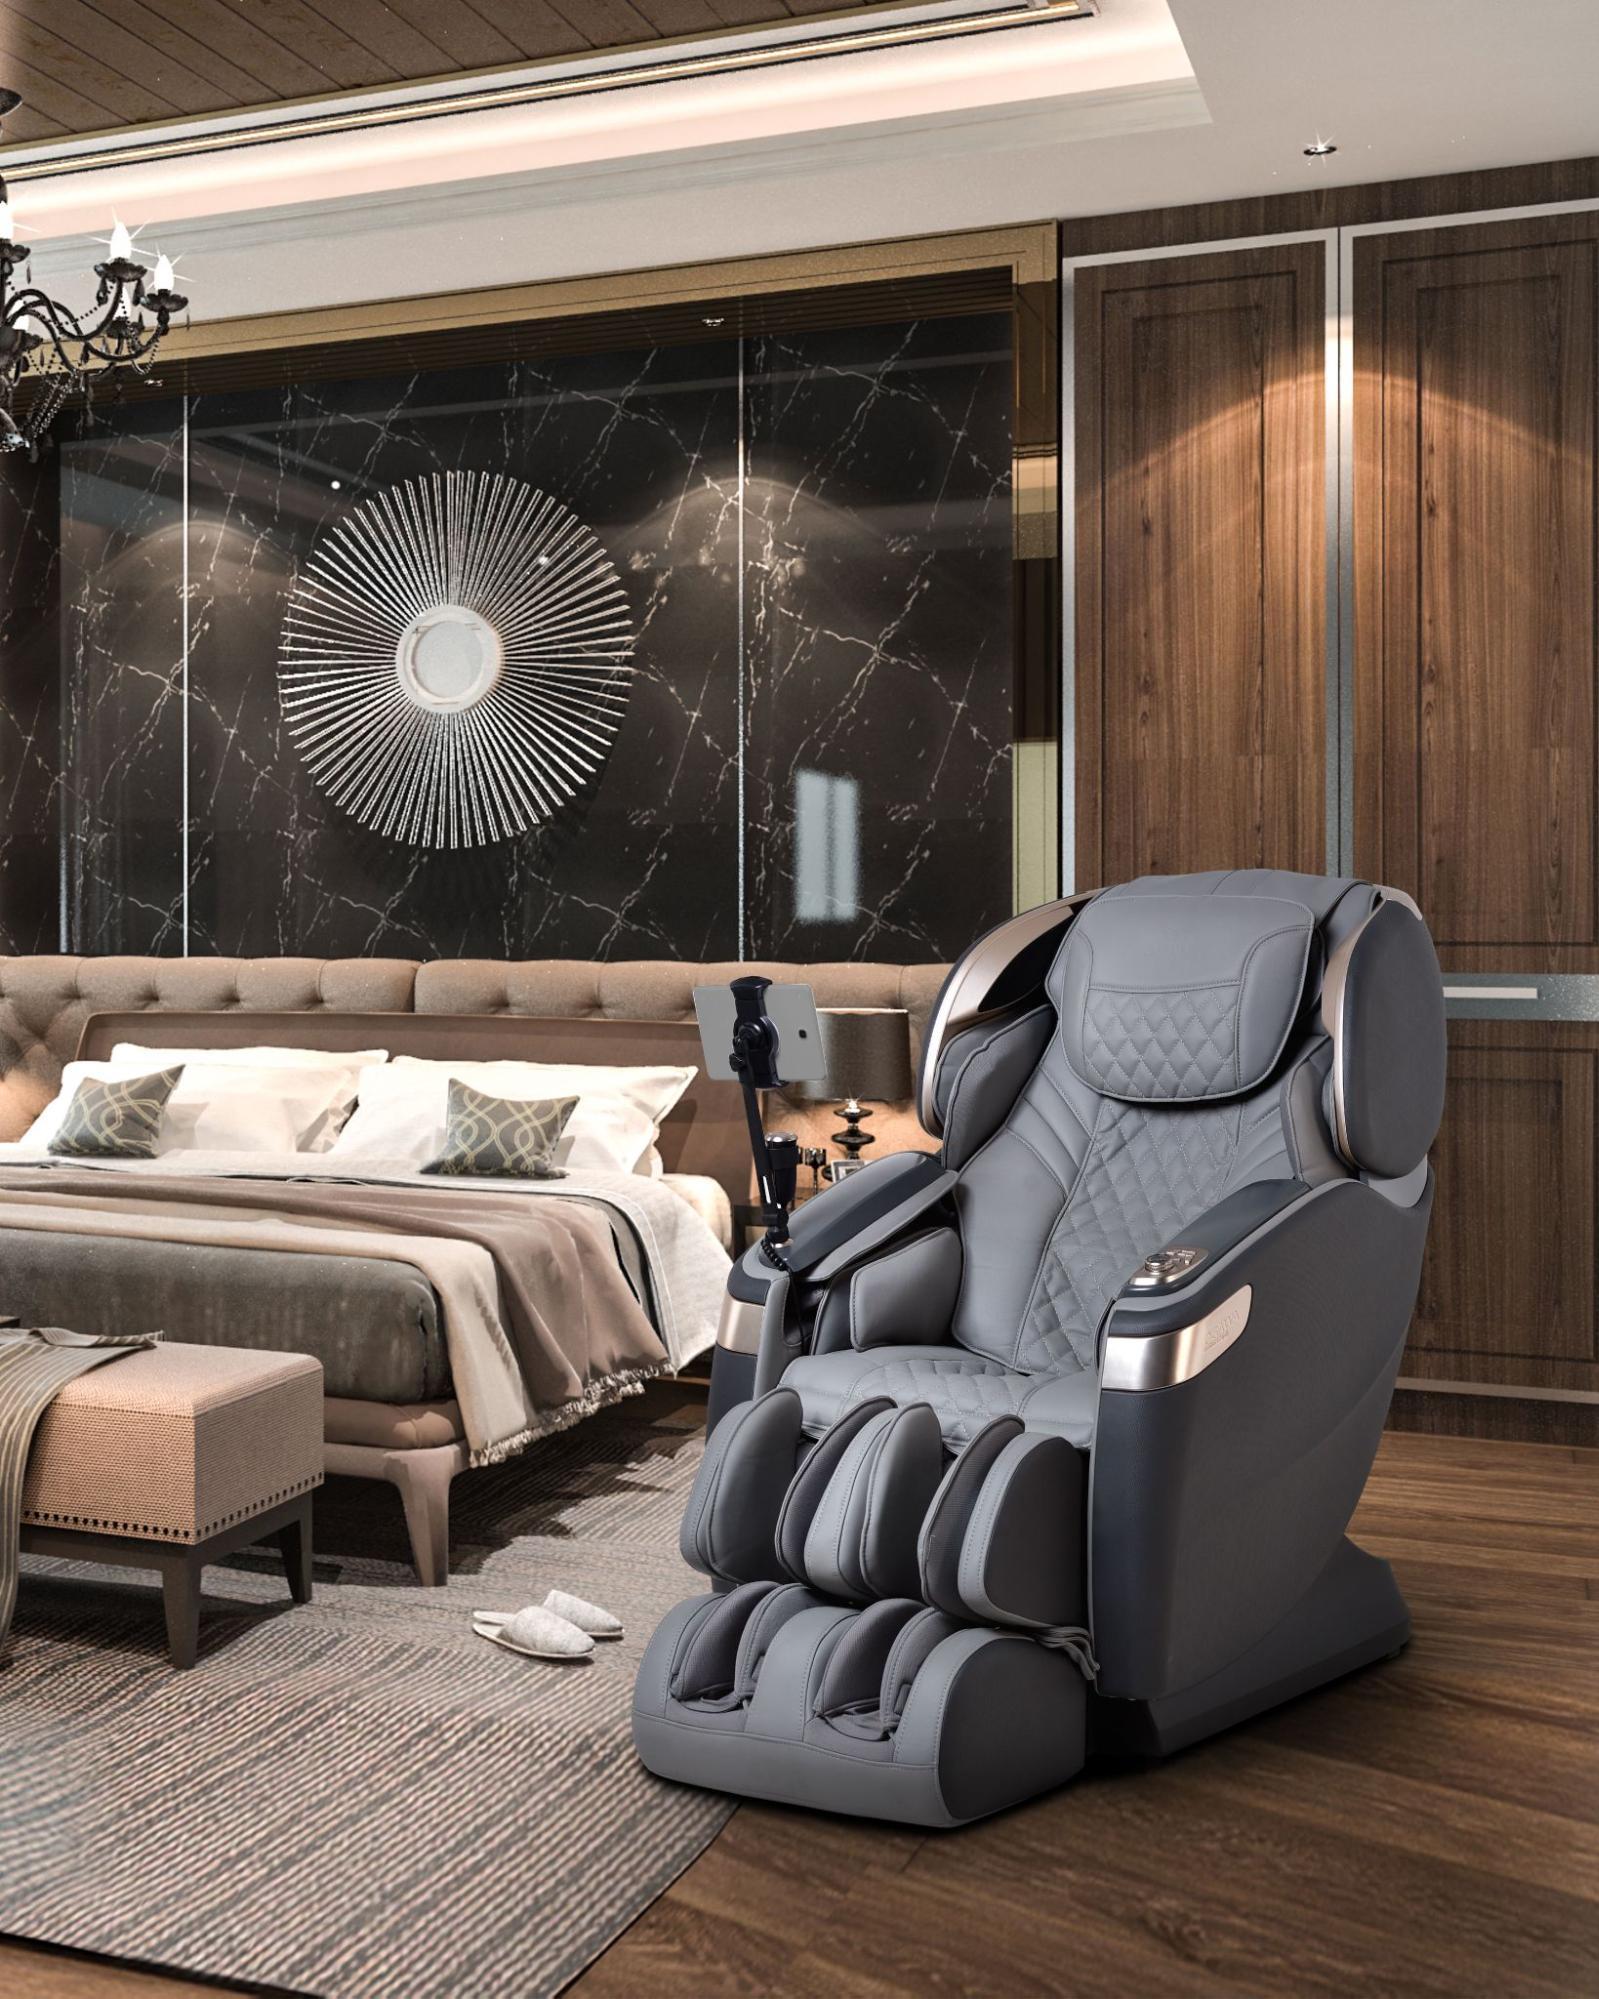 innovative home appliances - OGAWA Masterdrive A.I